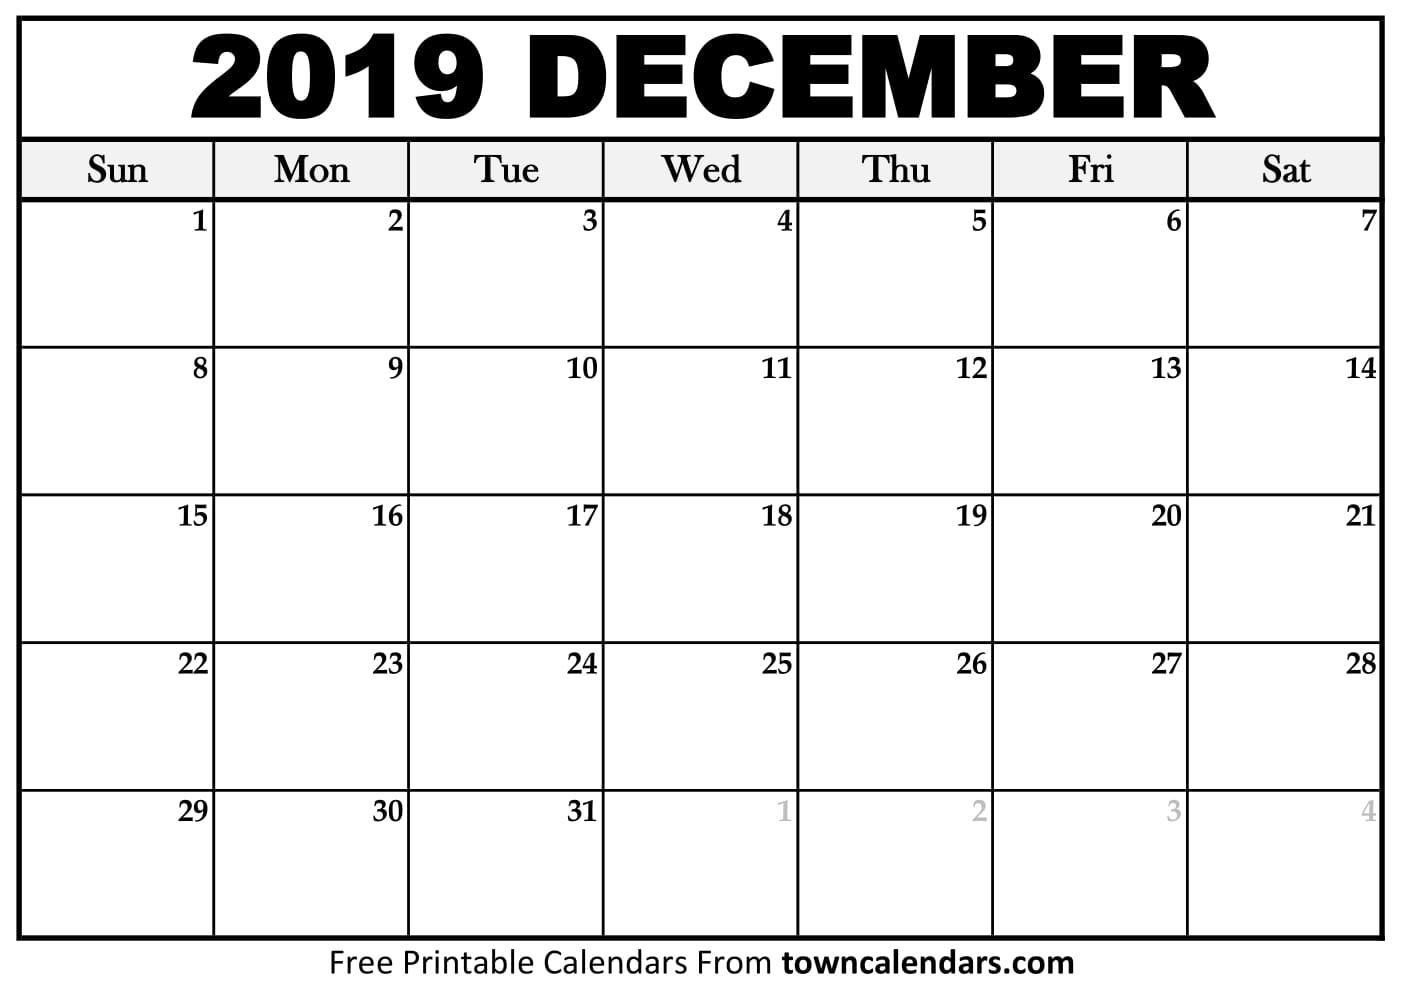 Printable December 2019 Calendar - Towncalendars